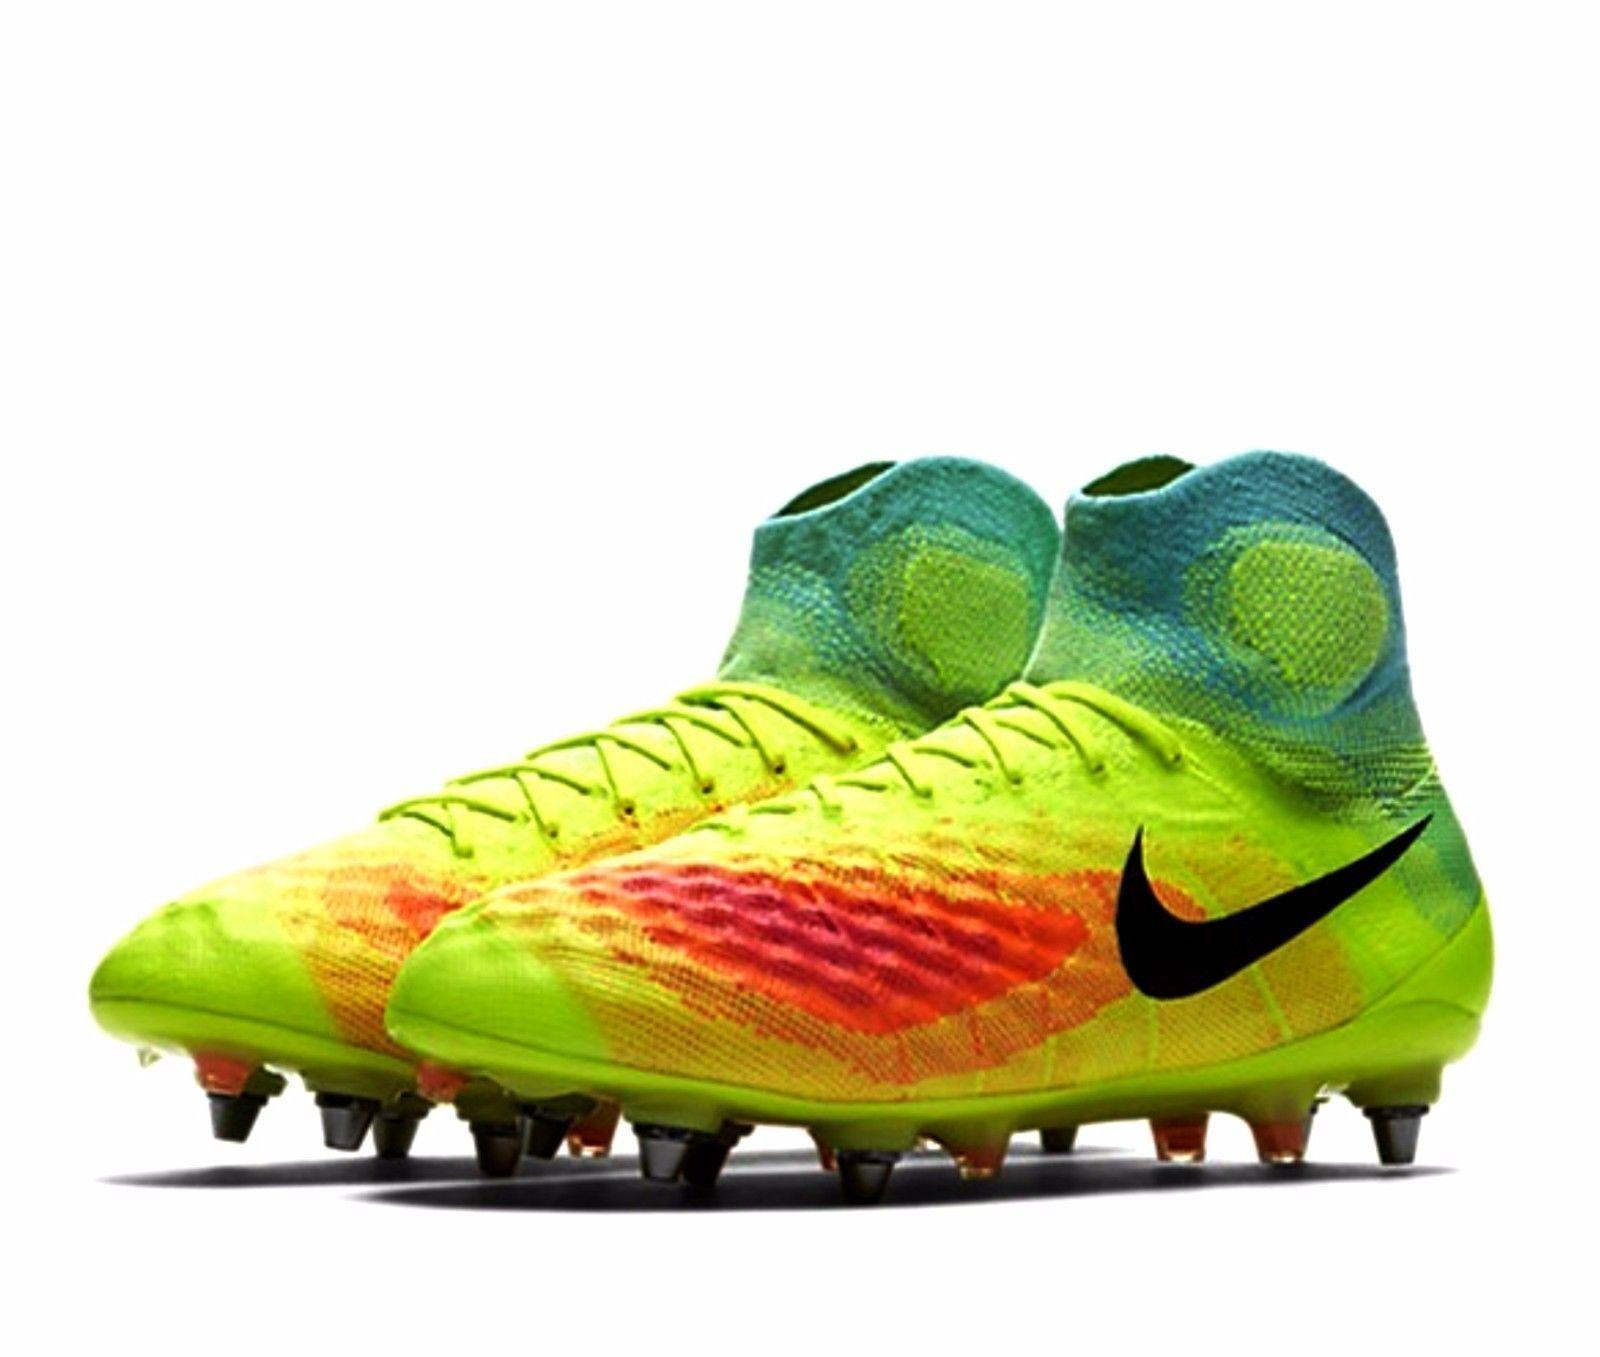 Nike Magista Obra Soccer Shoes for sale